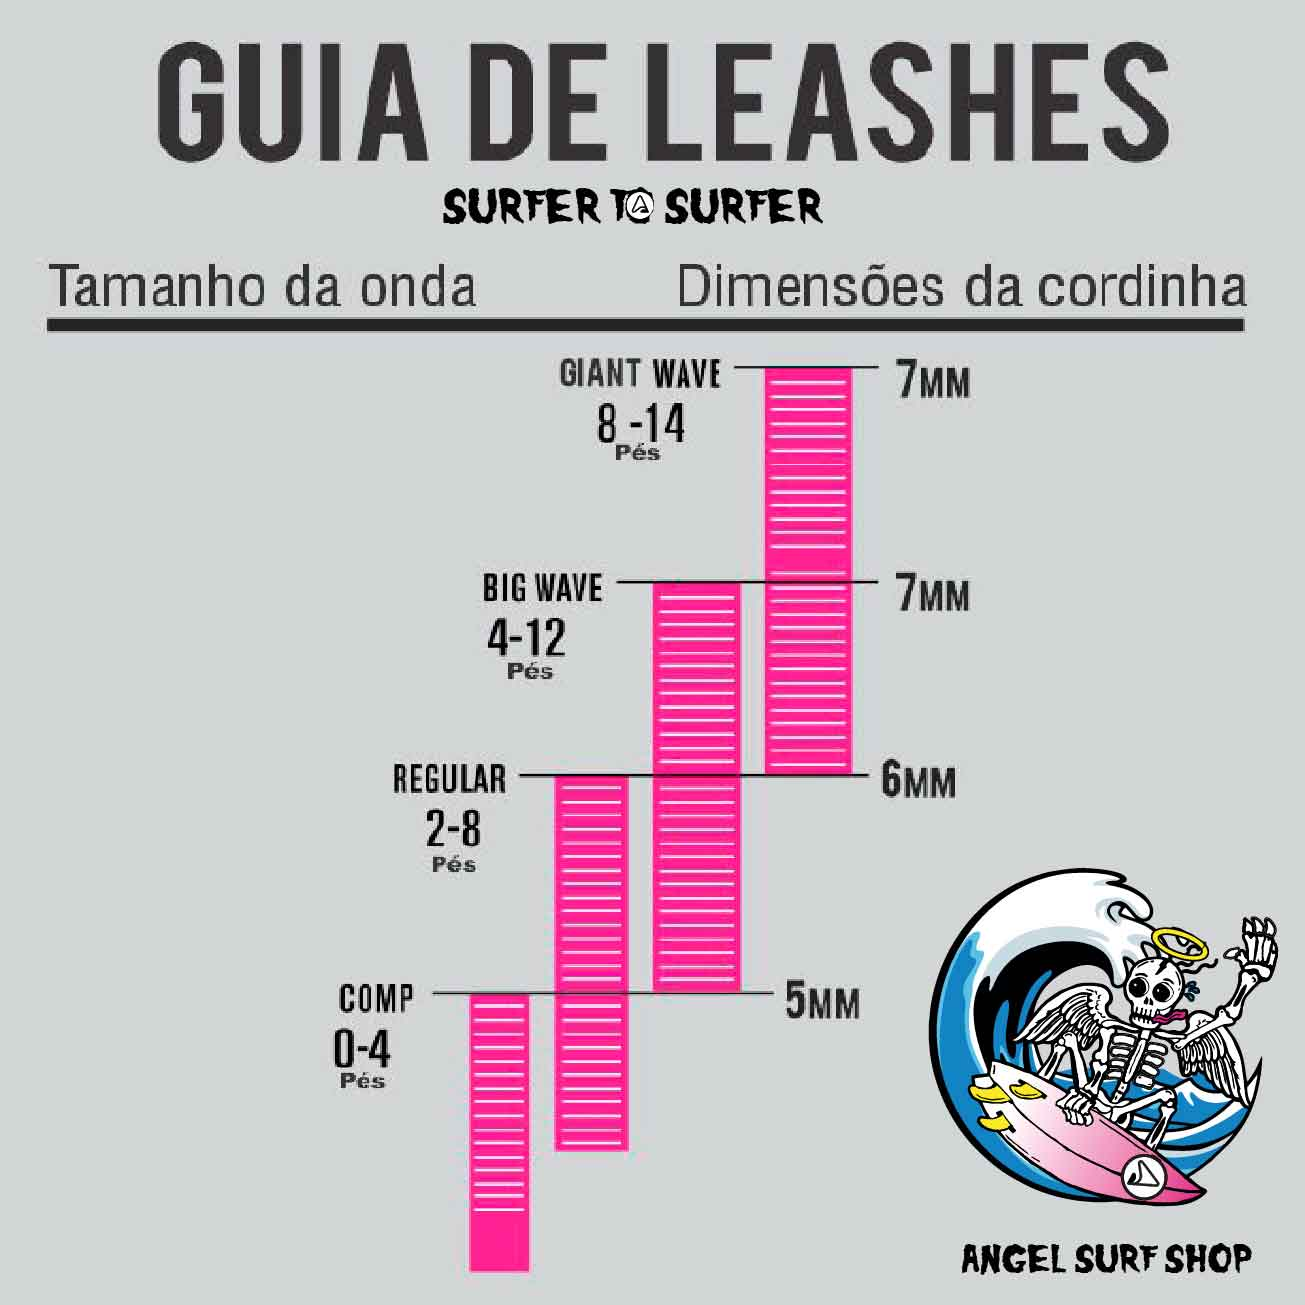 Leash Bully's COMPETIÇÃO Golden Series 6x5mm